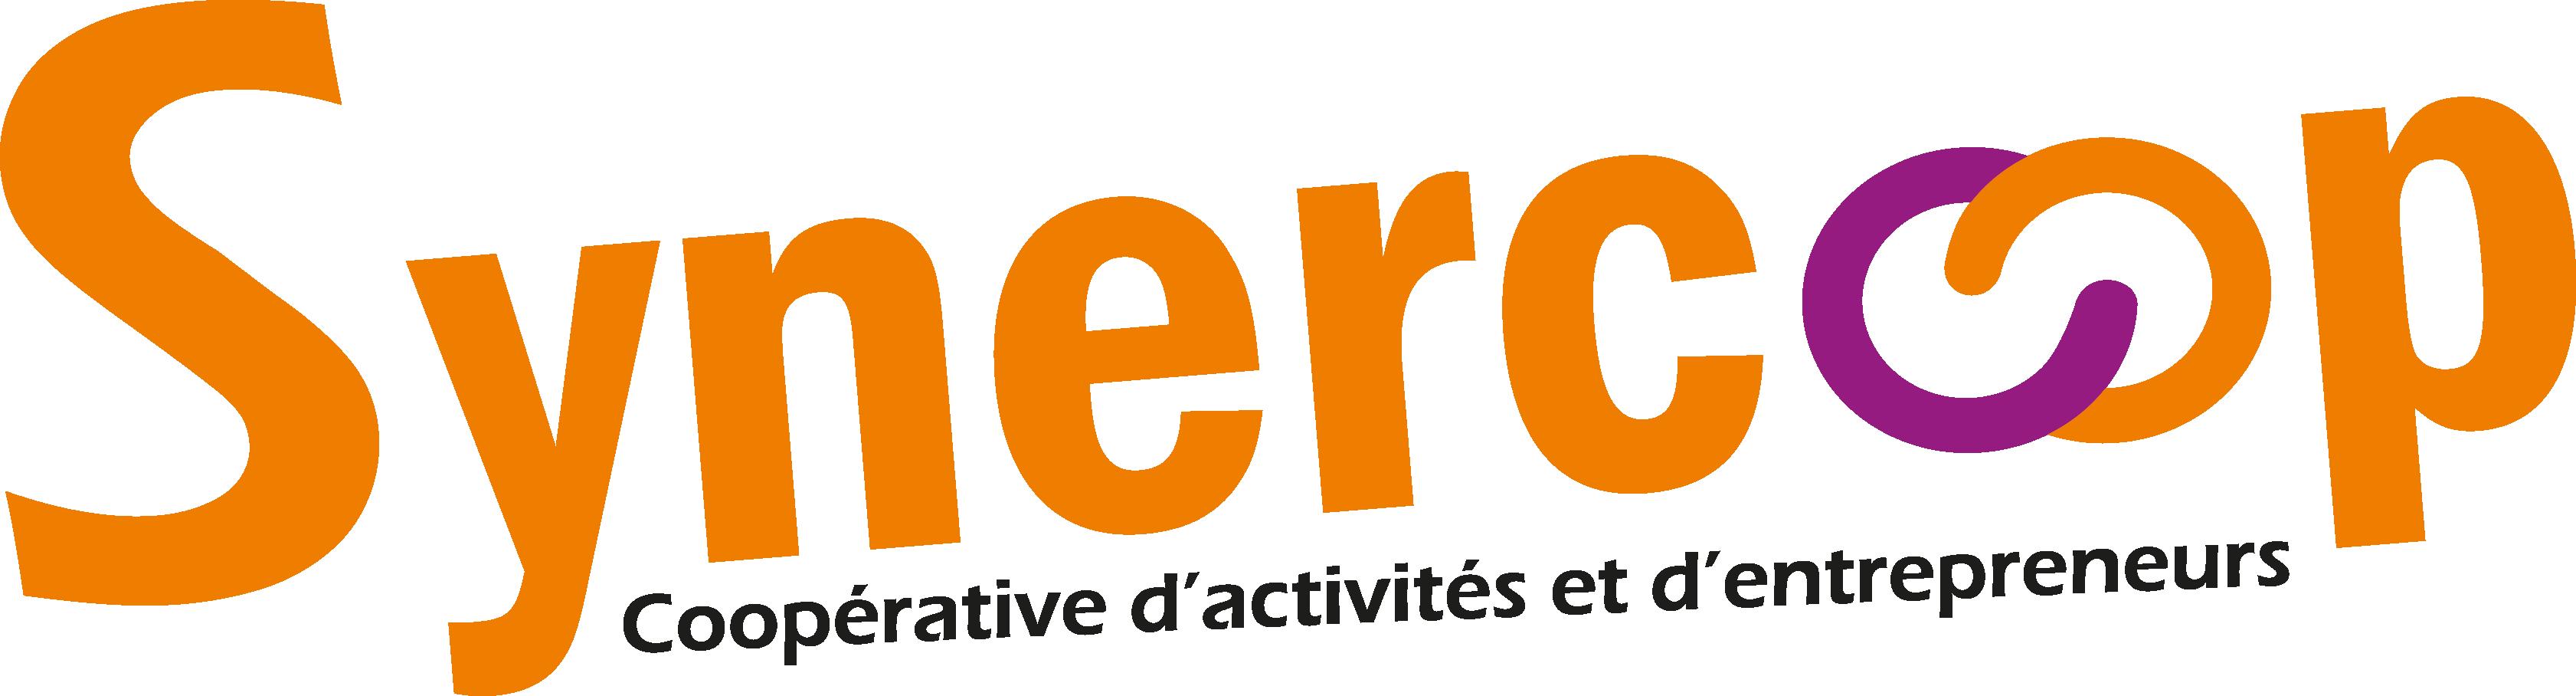 logo de synercoop